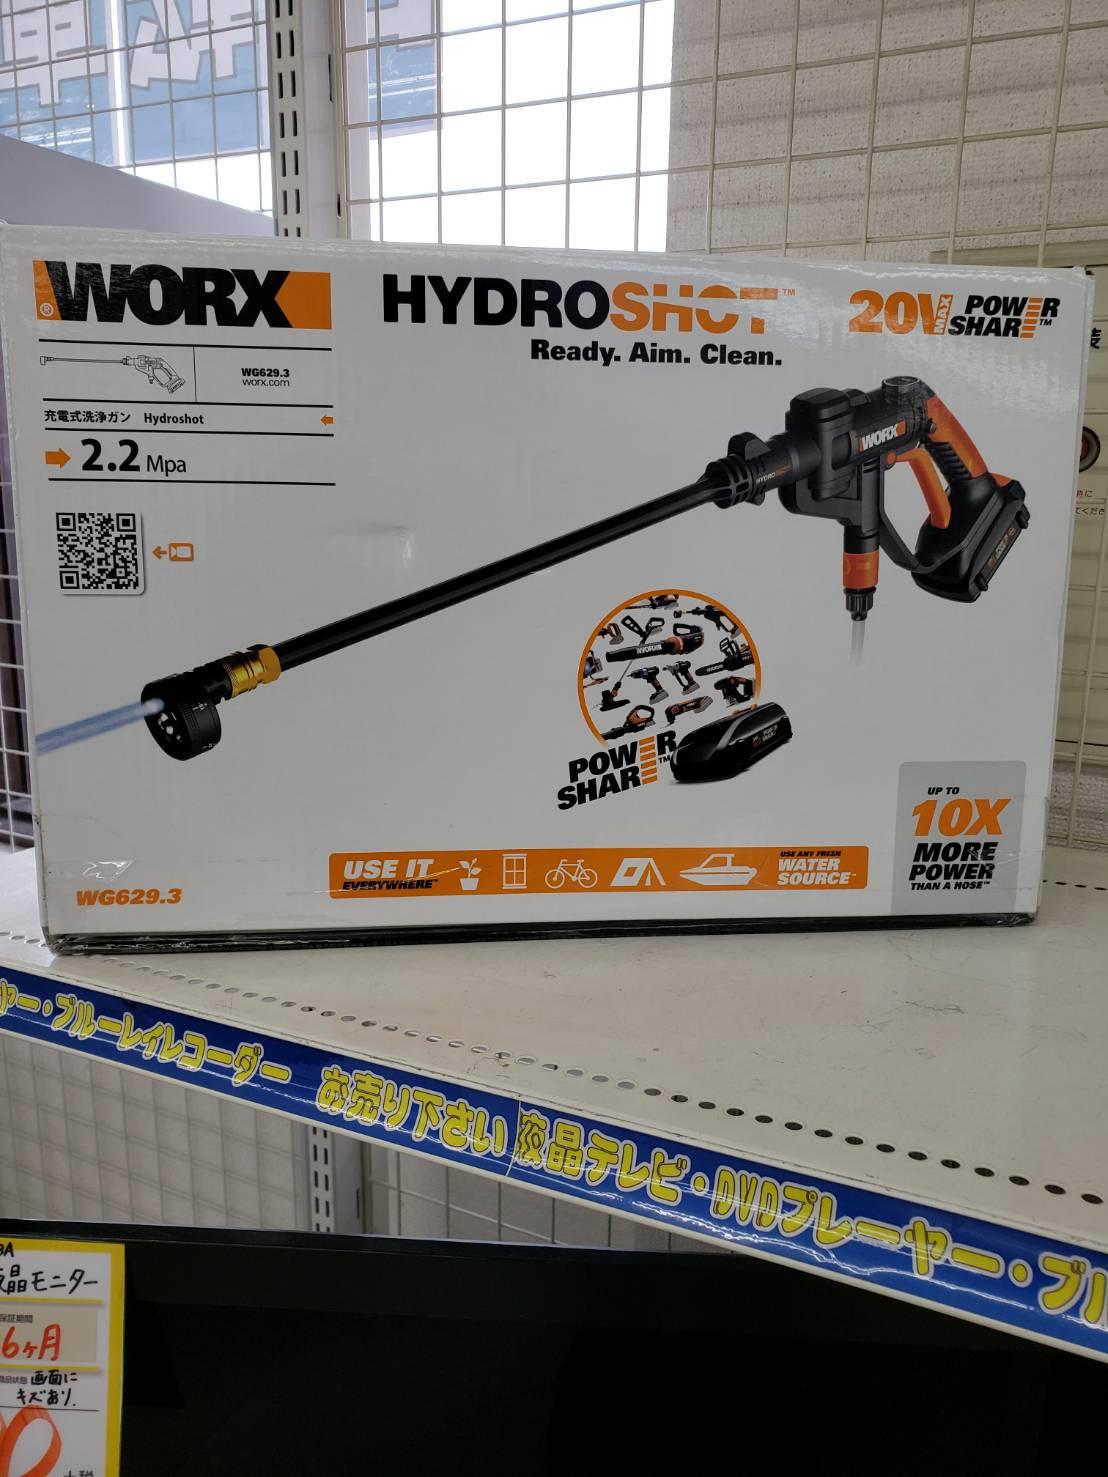 【WORX(ワークス)/ 充電式洗浄ガン / W629.3】買取させて頂きました!の買取-